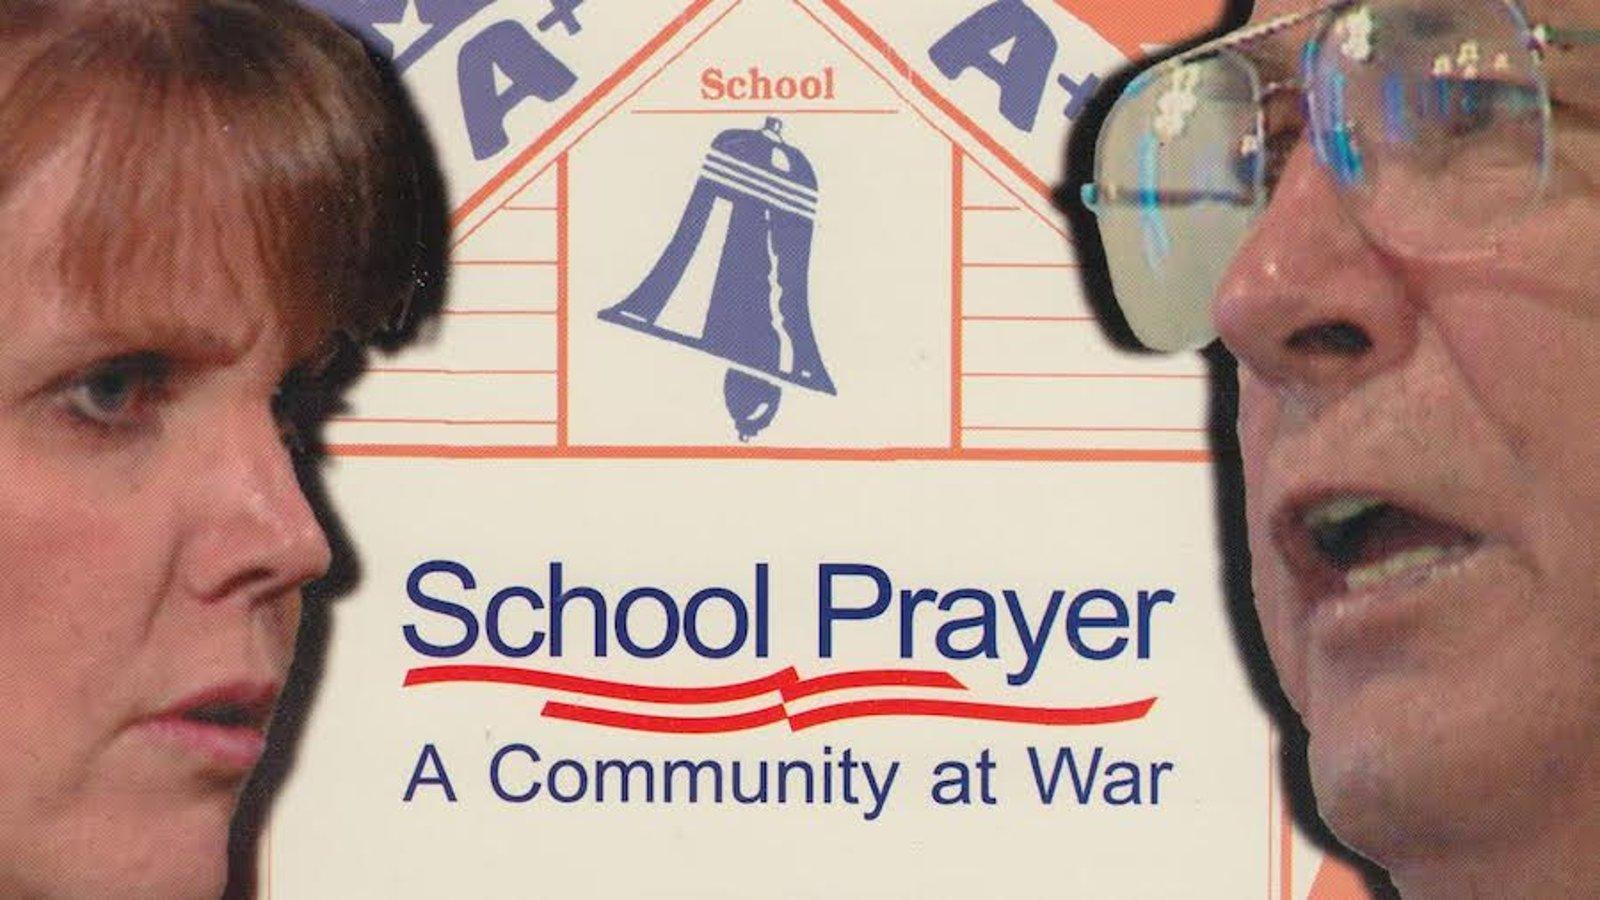 School Prayer: A Community at War